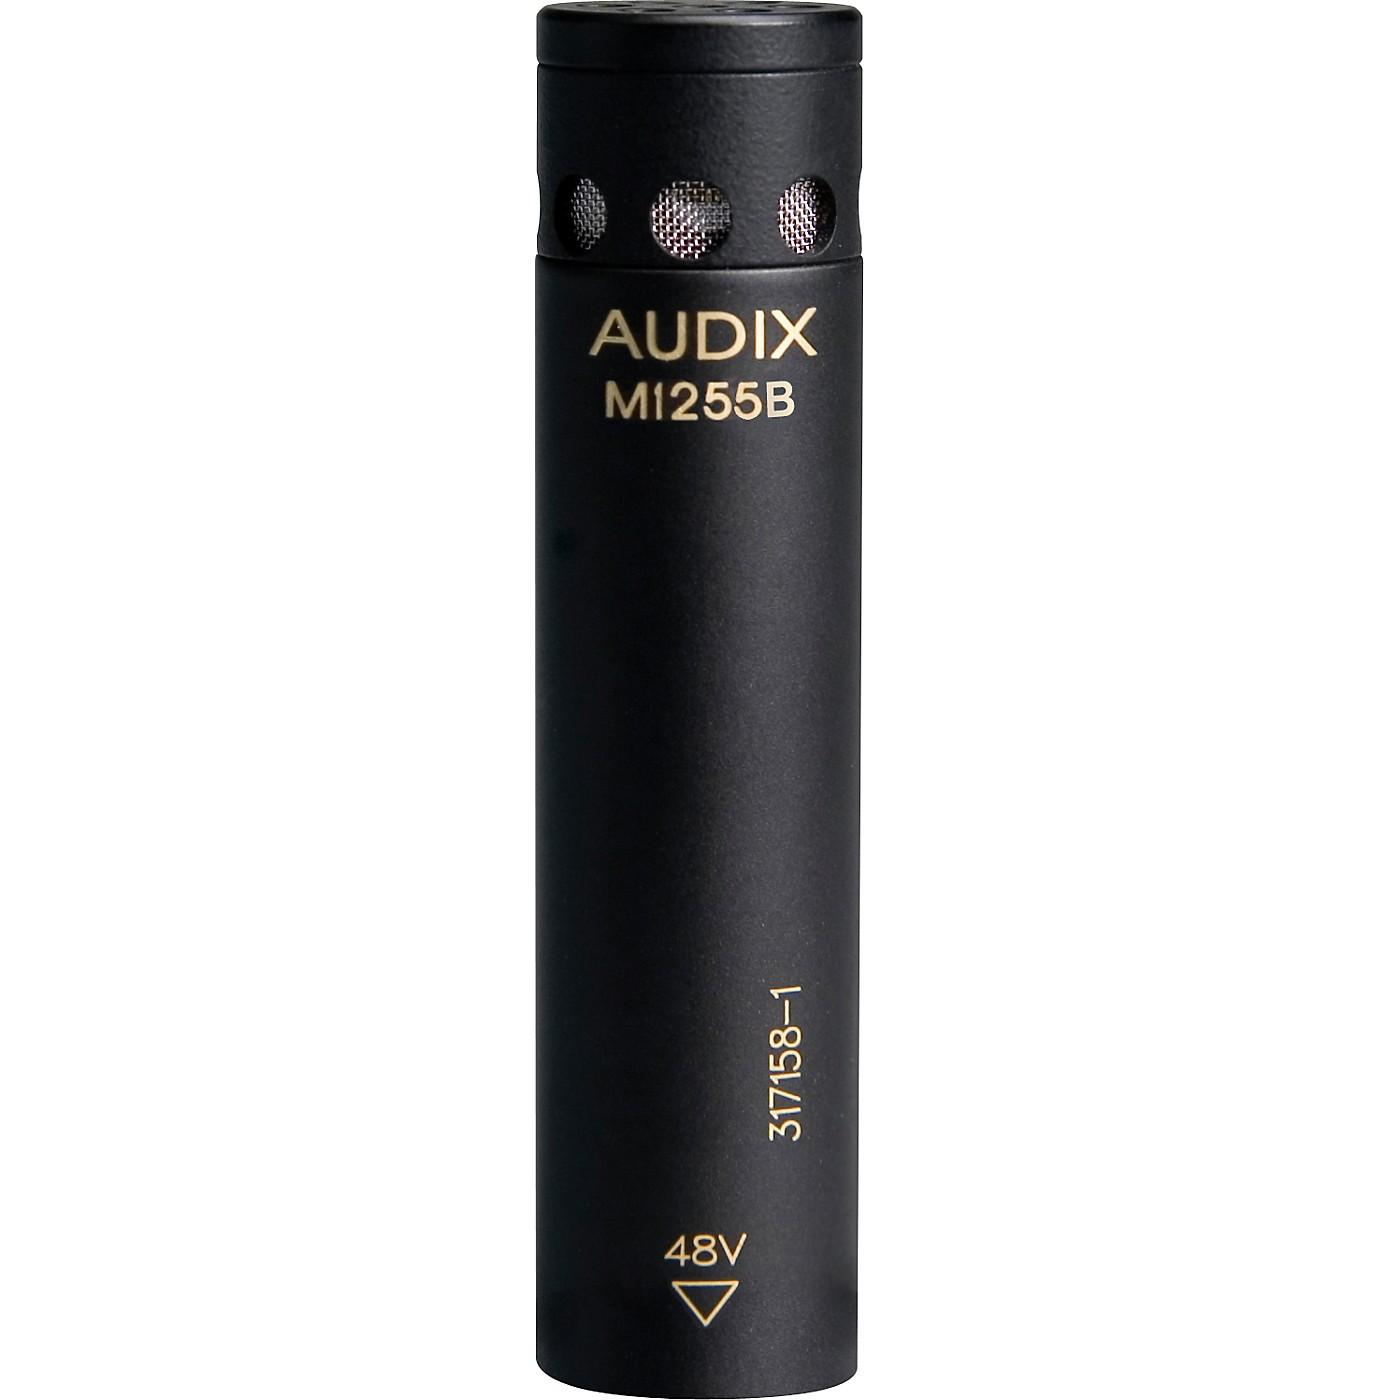 Audix M1255B Miniaturized Condenser Microphone thumbnail